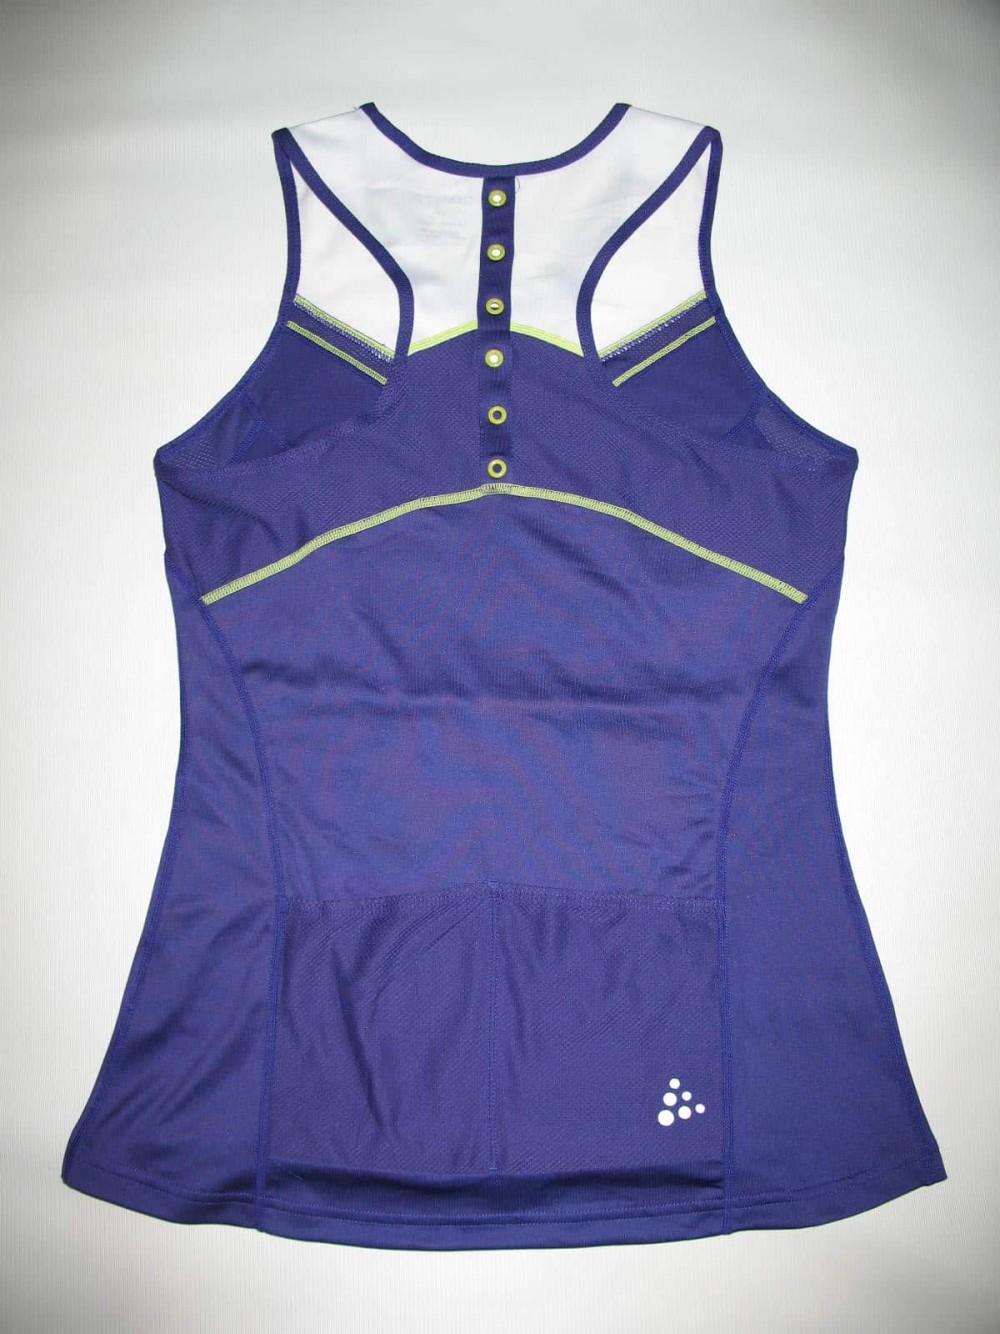 Веломайка CRAFT active bike jersey lady (размер M) - 4